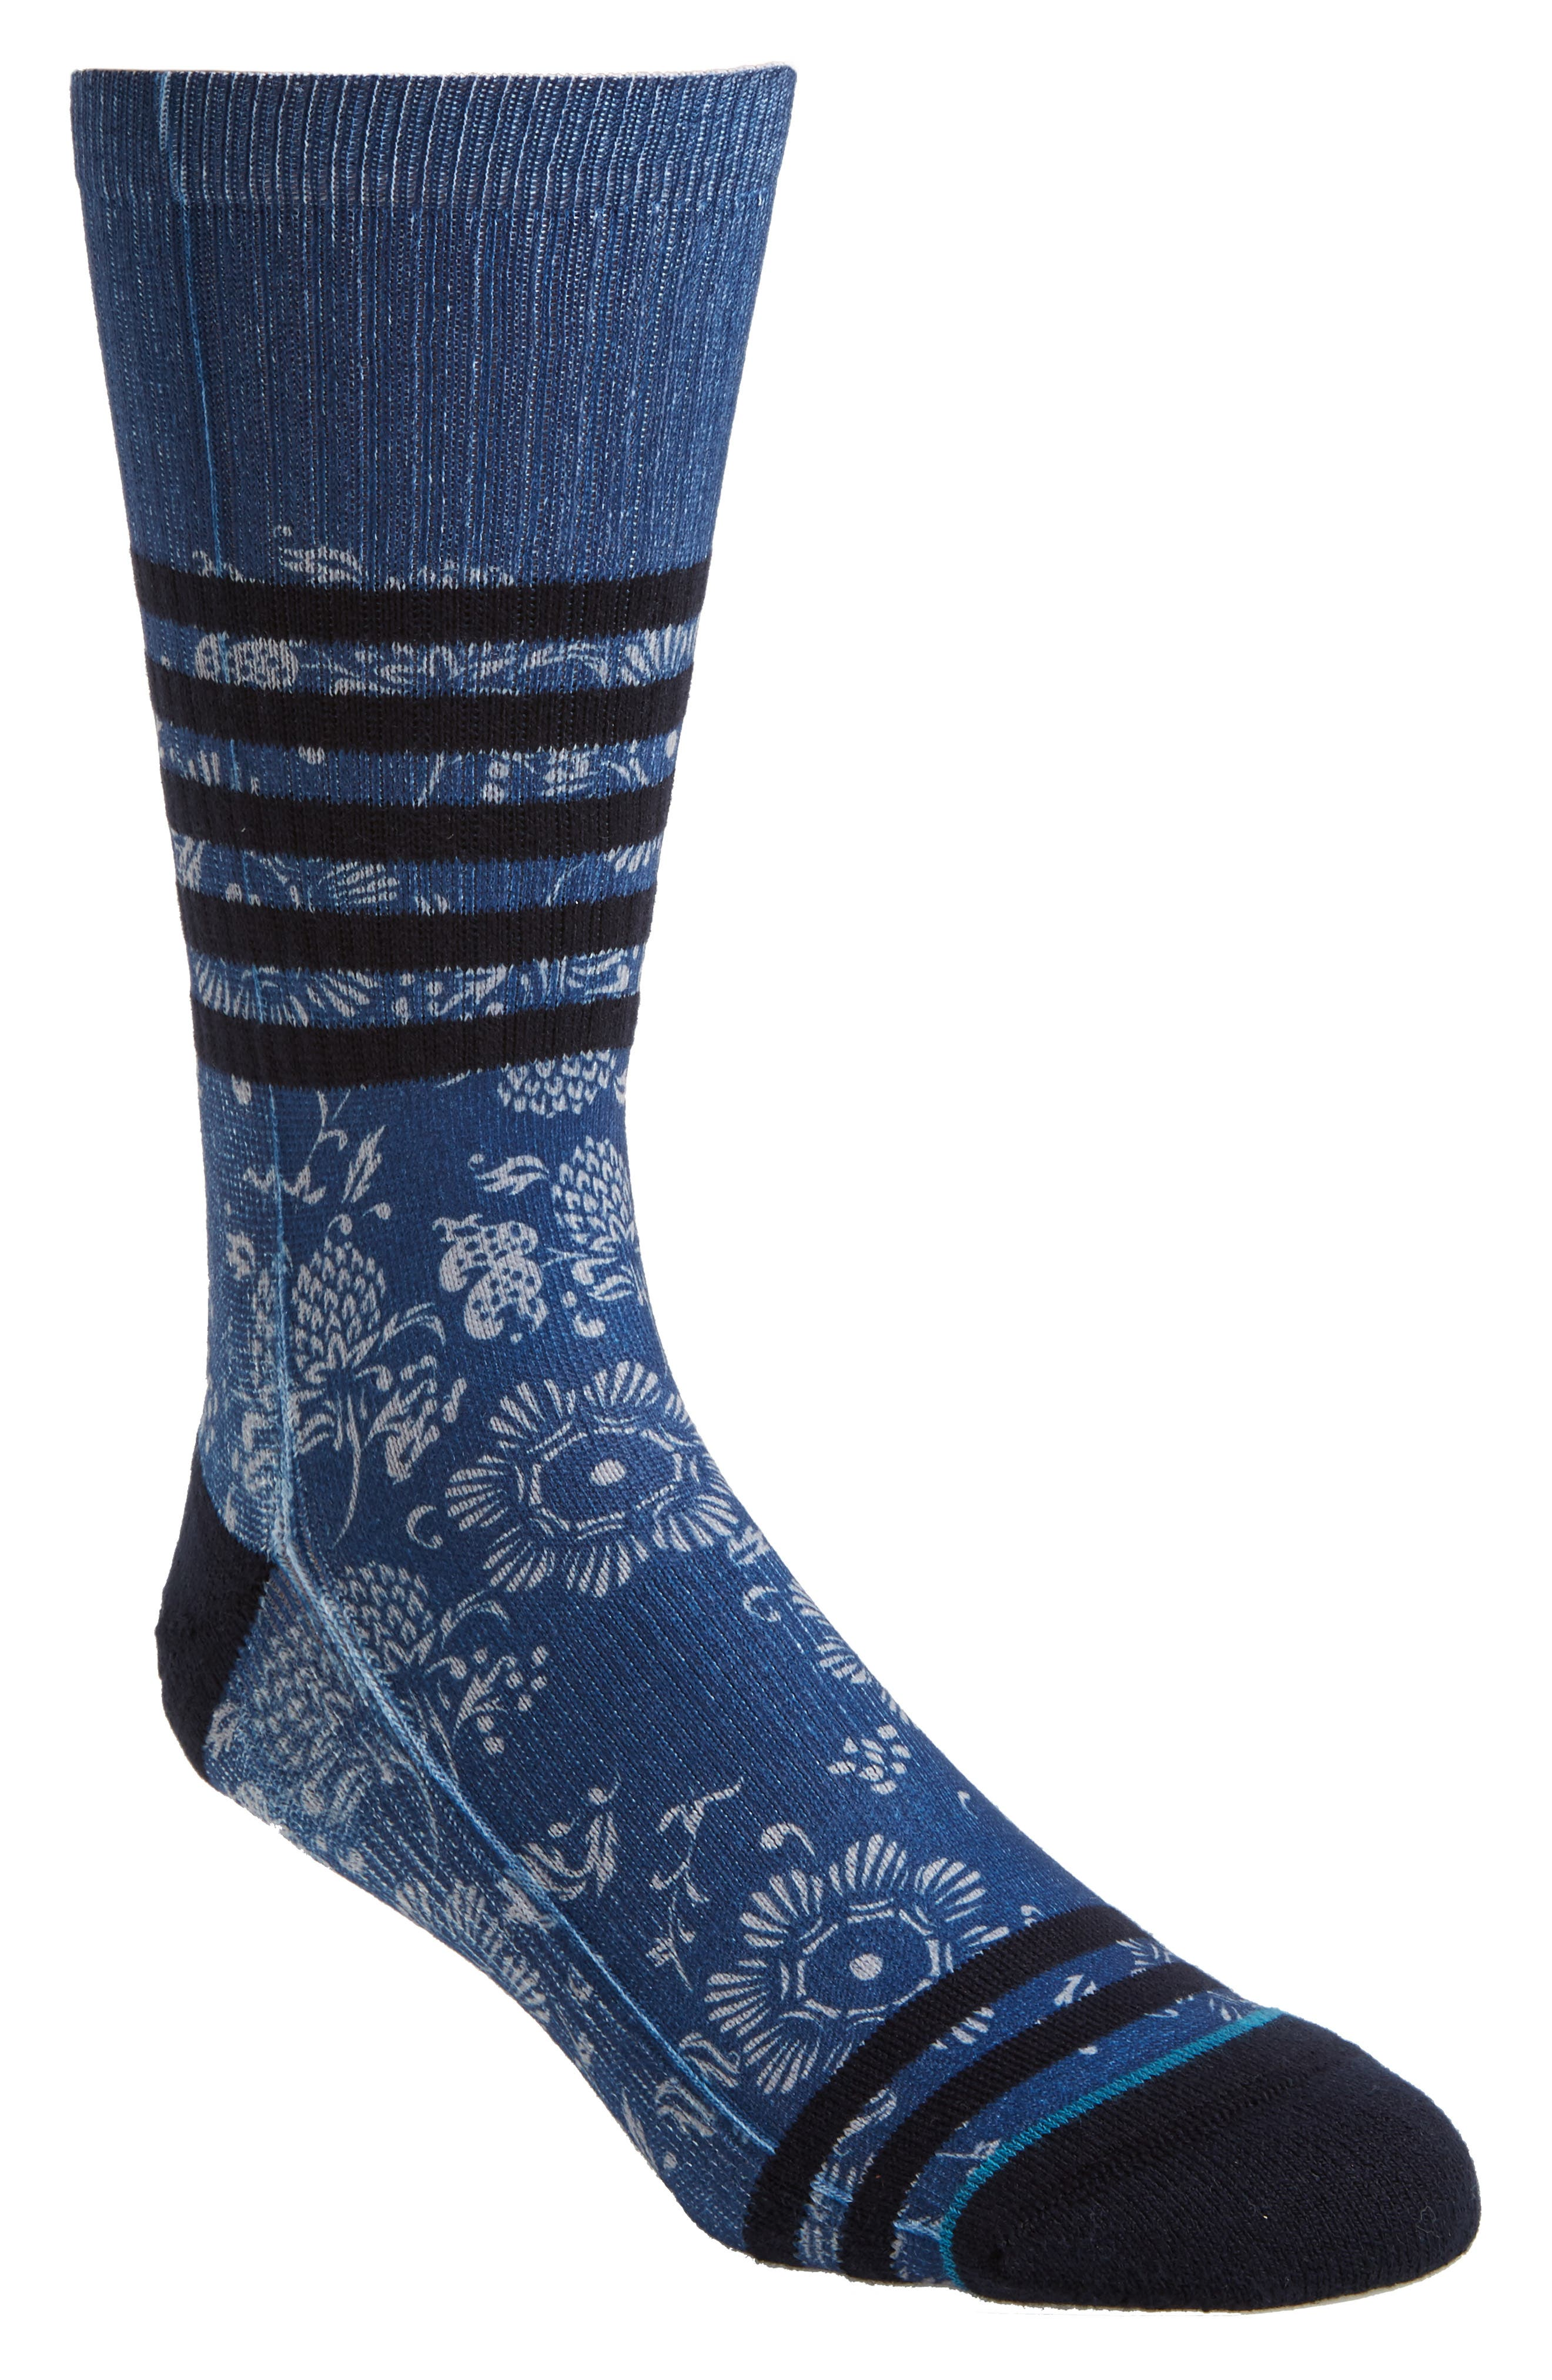 Alternate Image 1 Selected - Stance Briar Socks